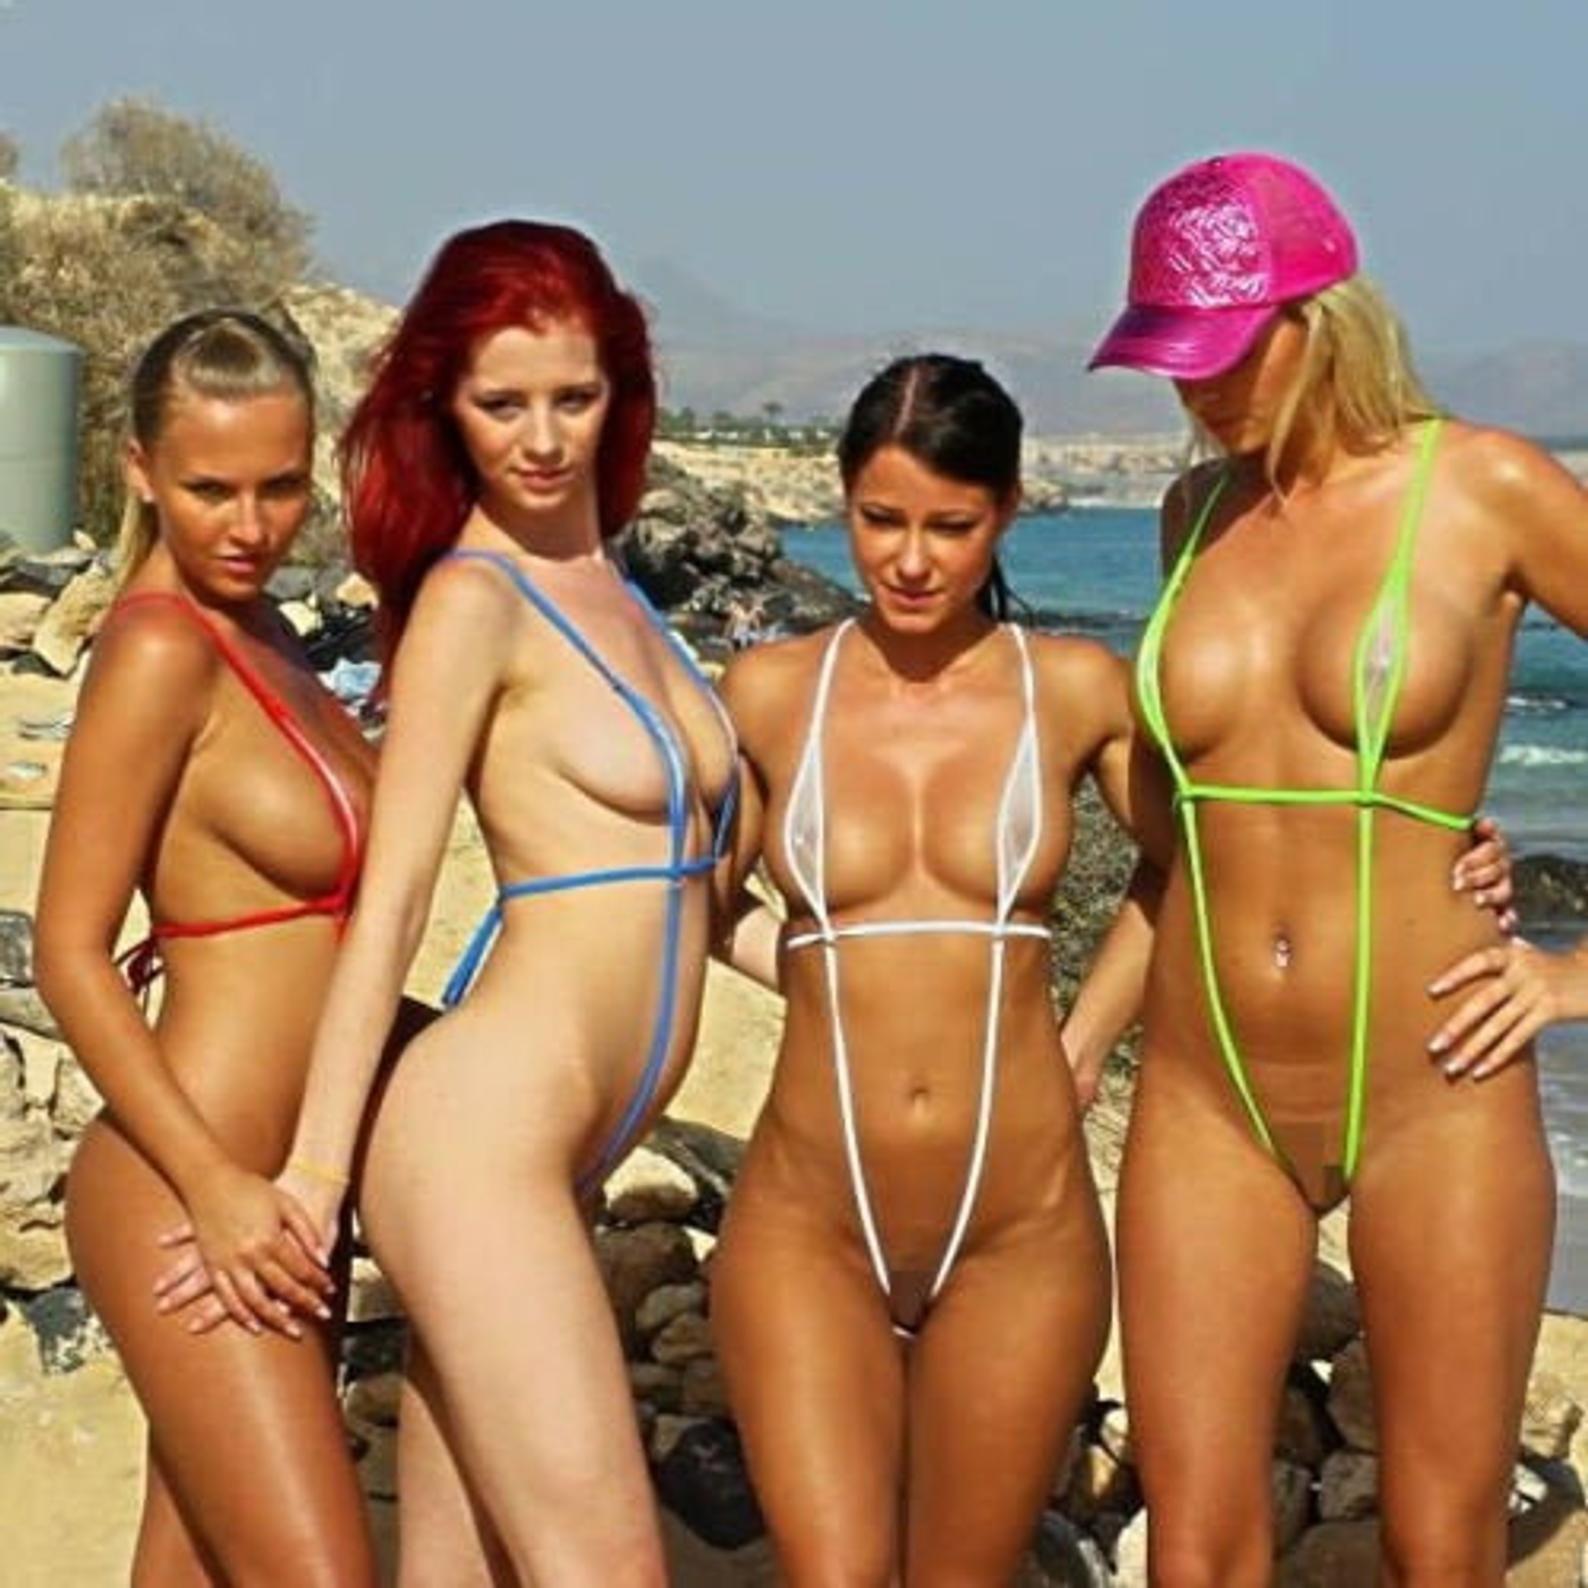 Ouvert bikini SnSbikinis Online